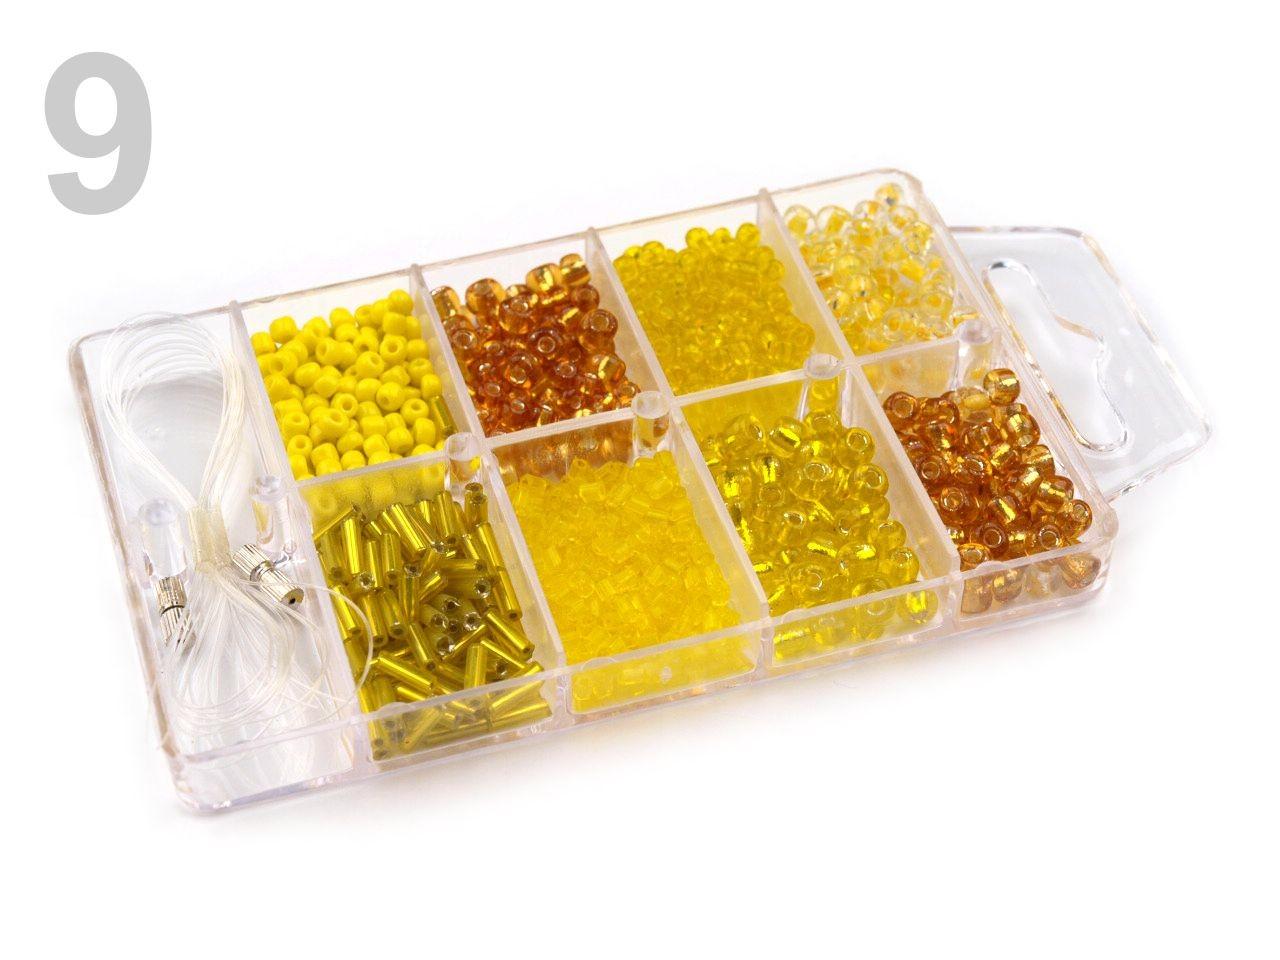 Korálky ROKAJL v plastovém boxu 210878 1krab, - 53 Kč / krab, 9 Aspen Gold